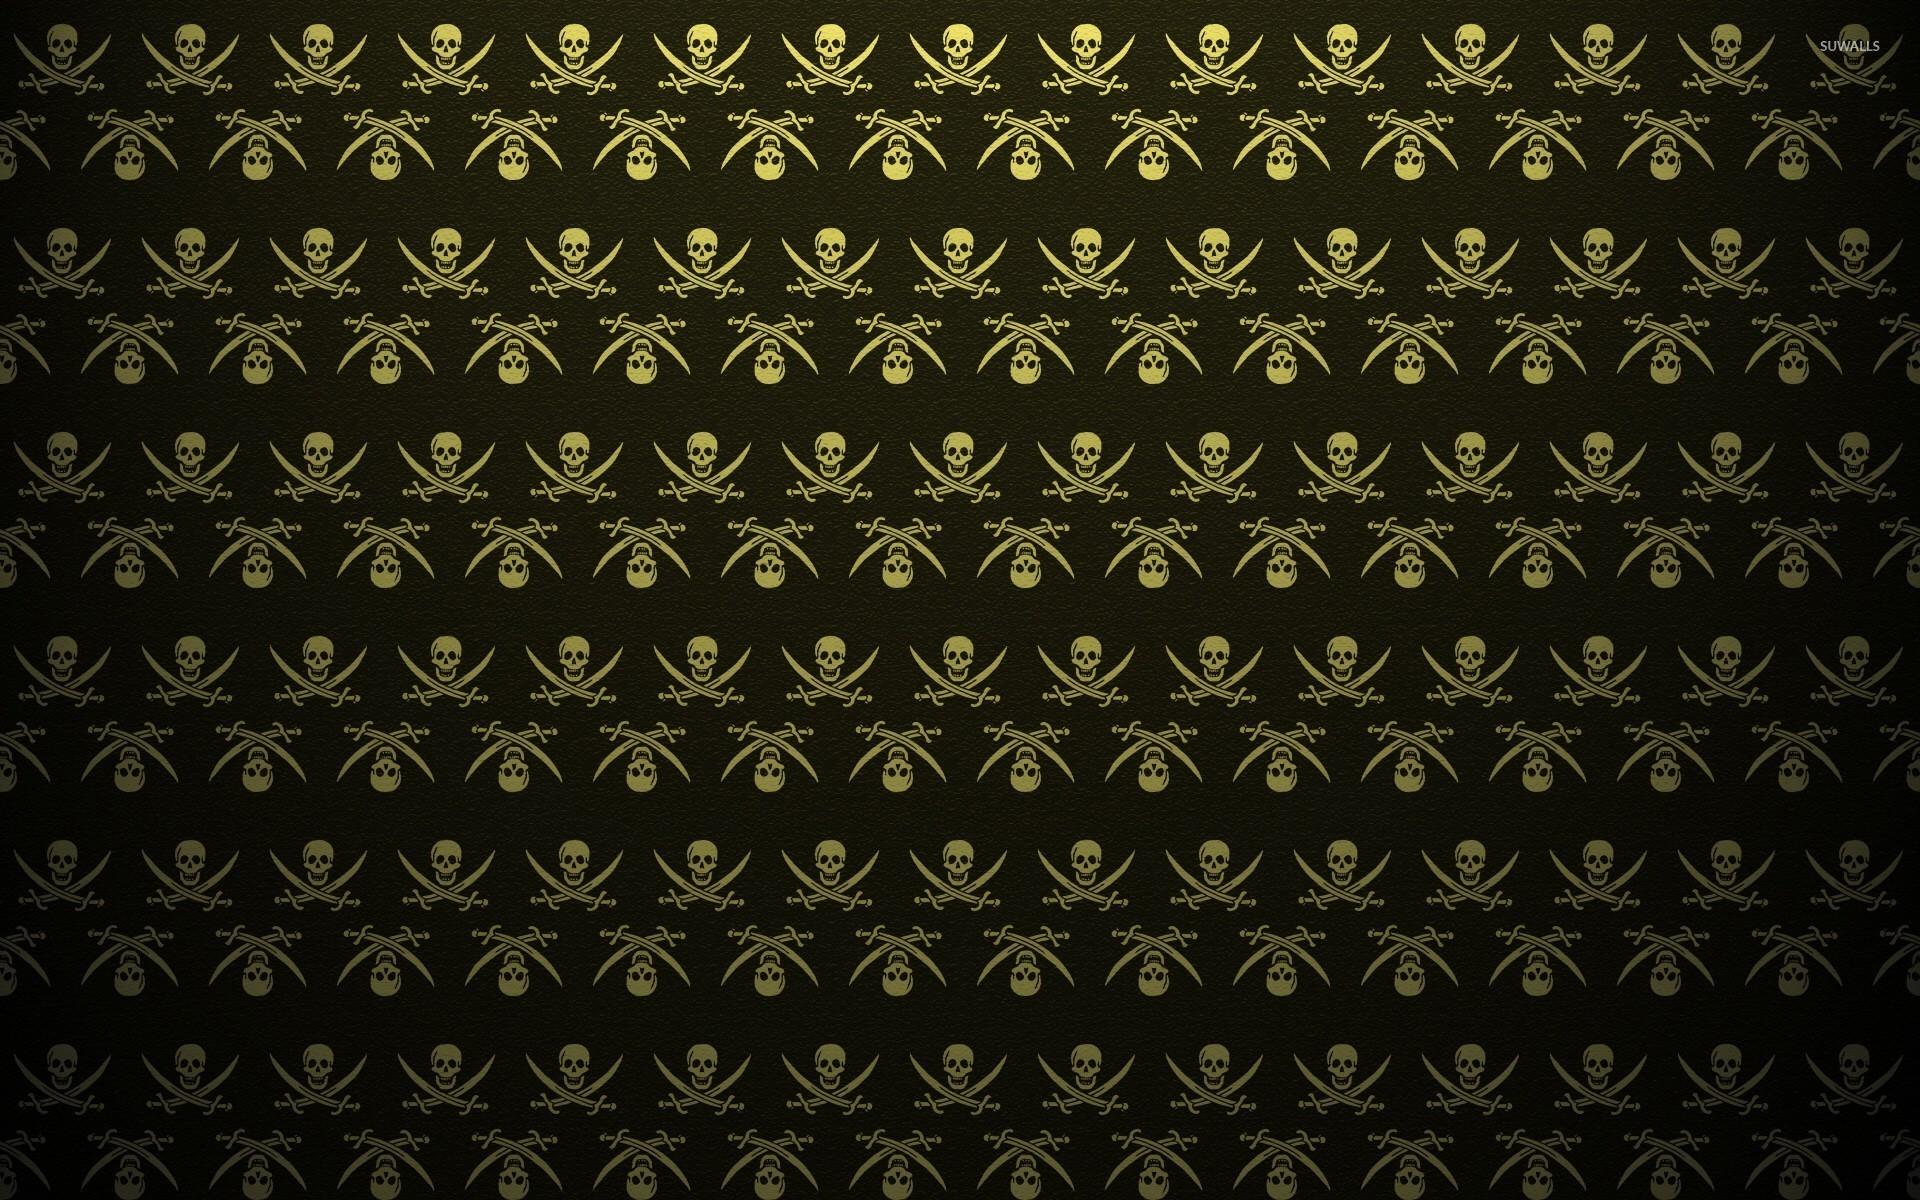 Pirate flag pattern wallpaper jpg